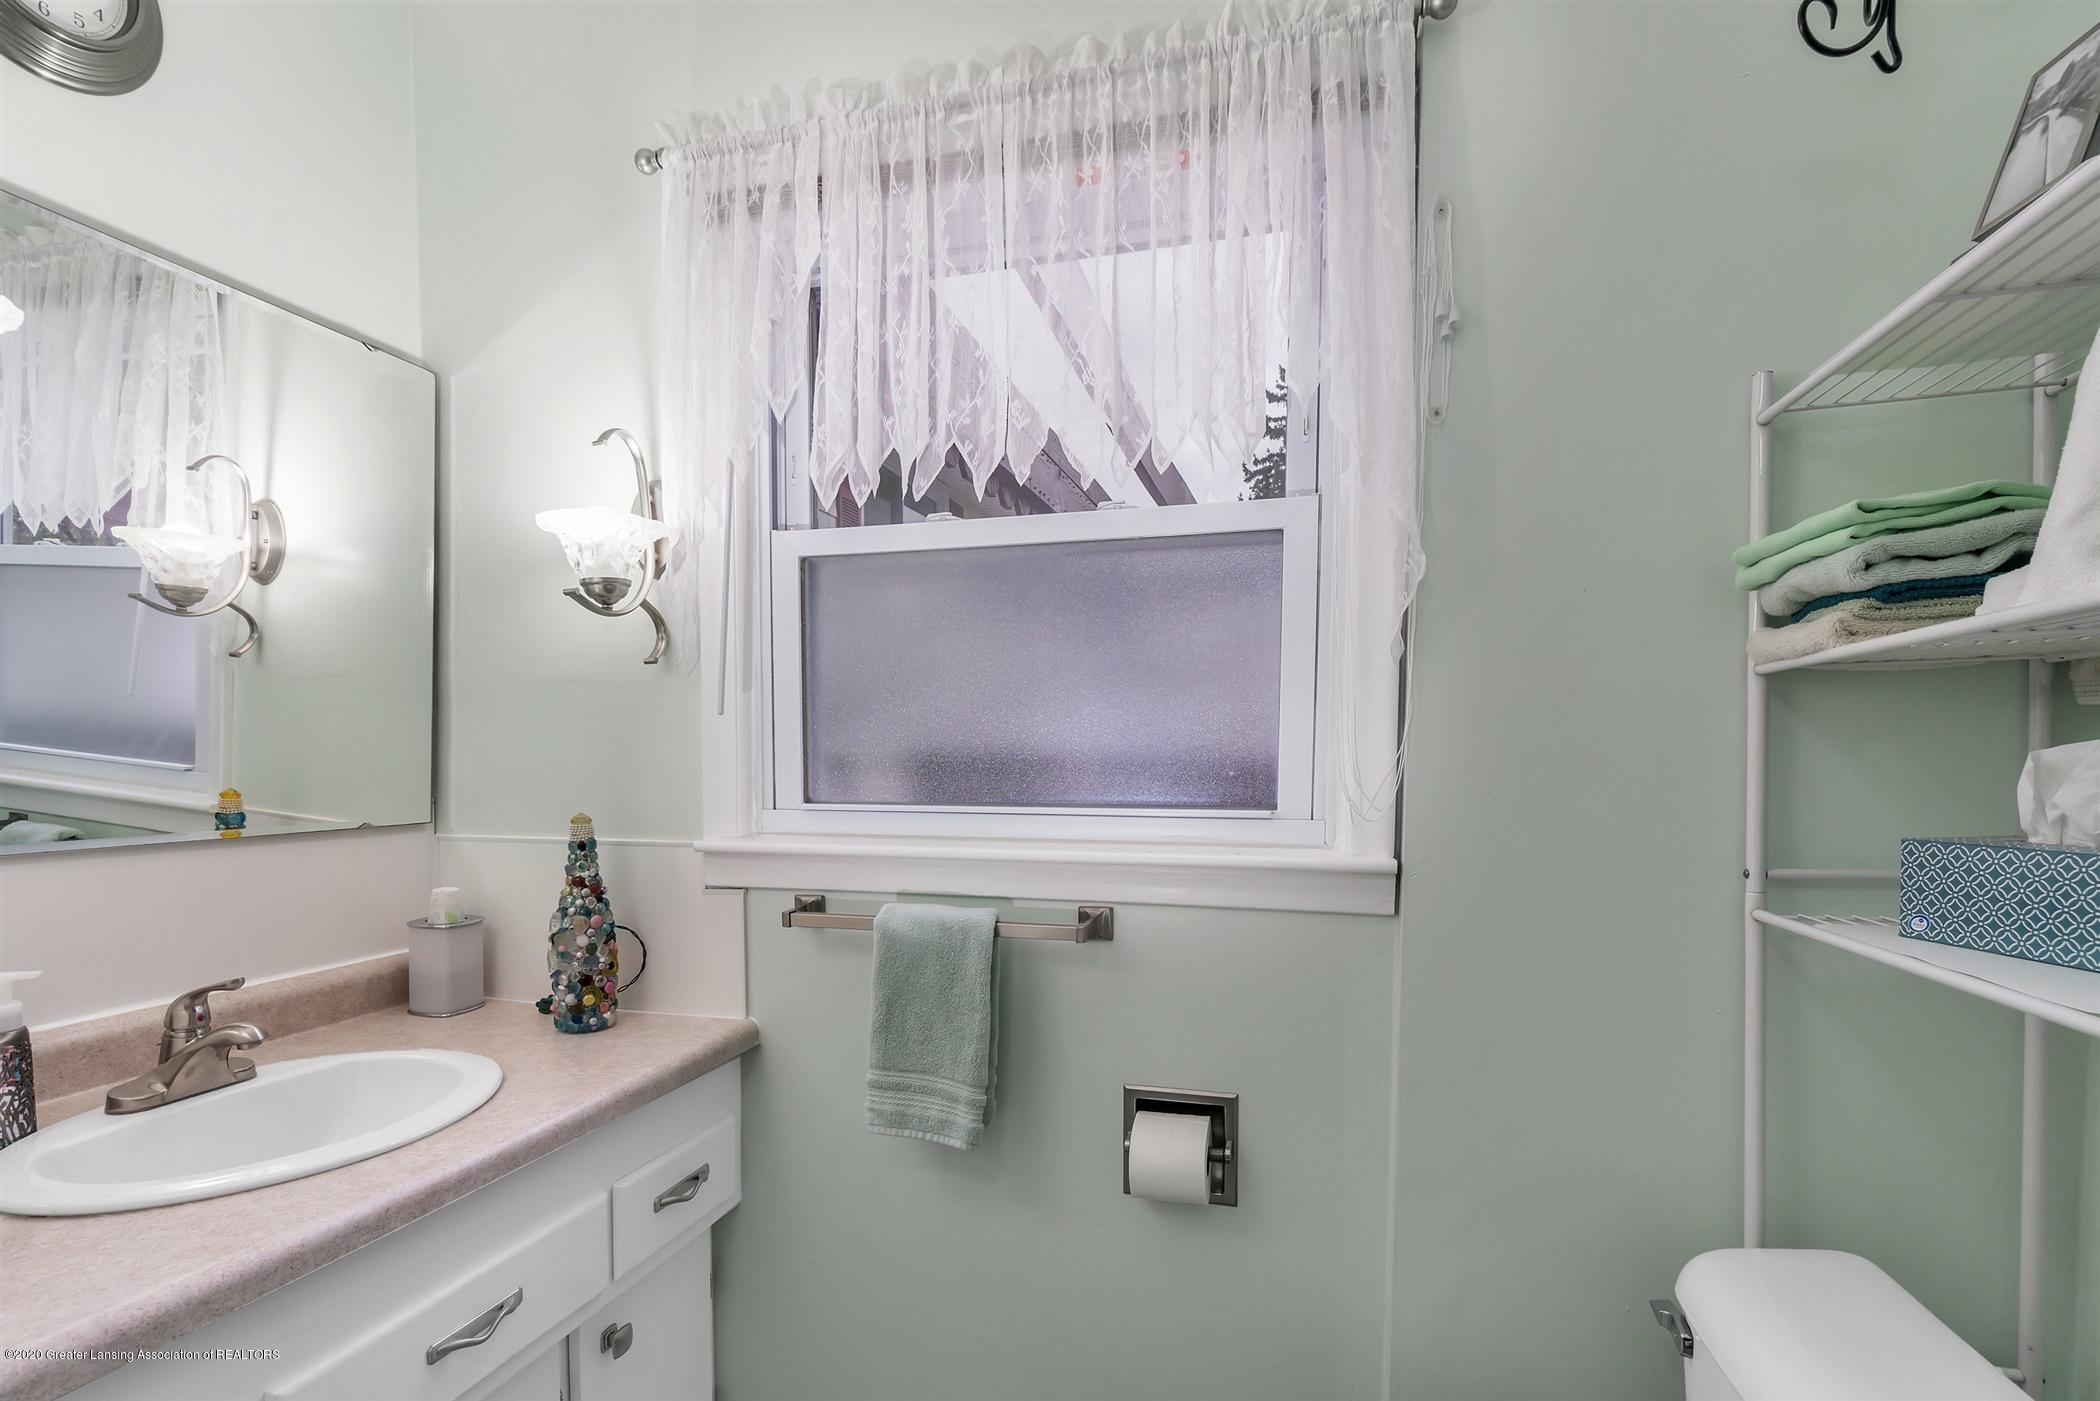 4385 Holt Rd - 27-4385 Holt Rd.-WindowStill-Real-E - 27